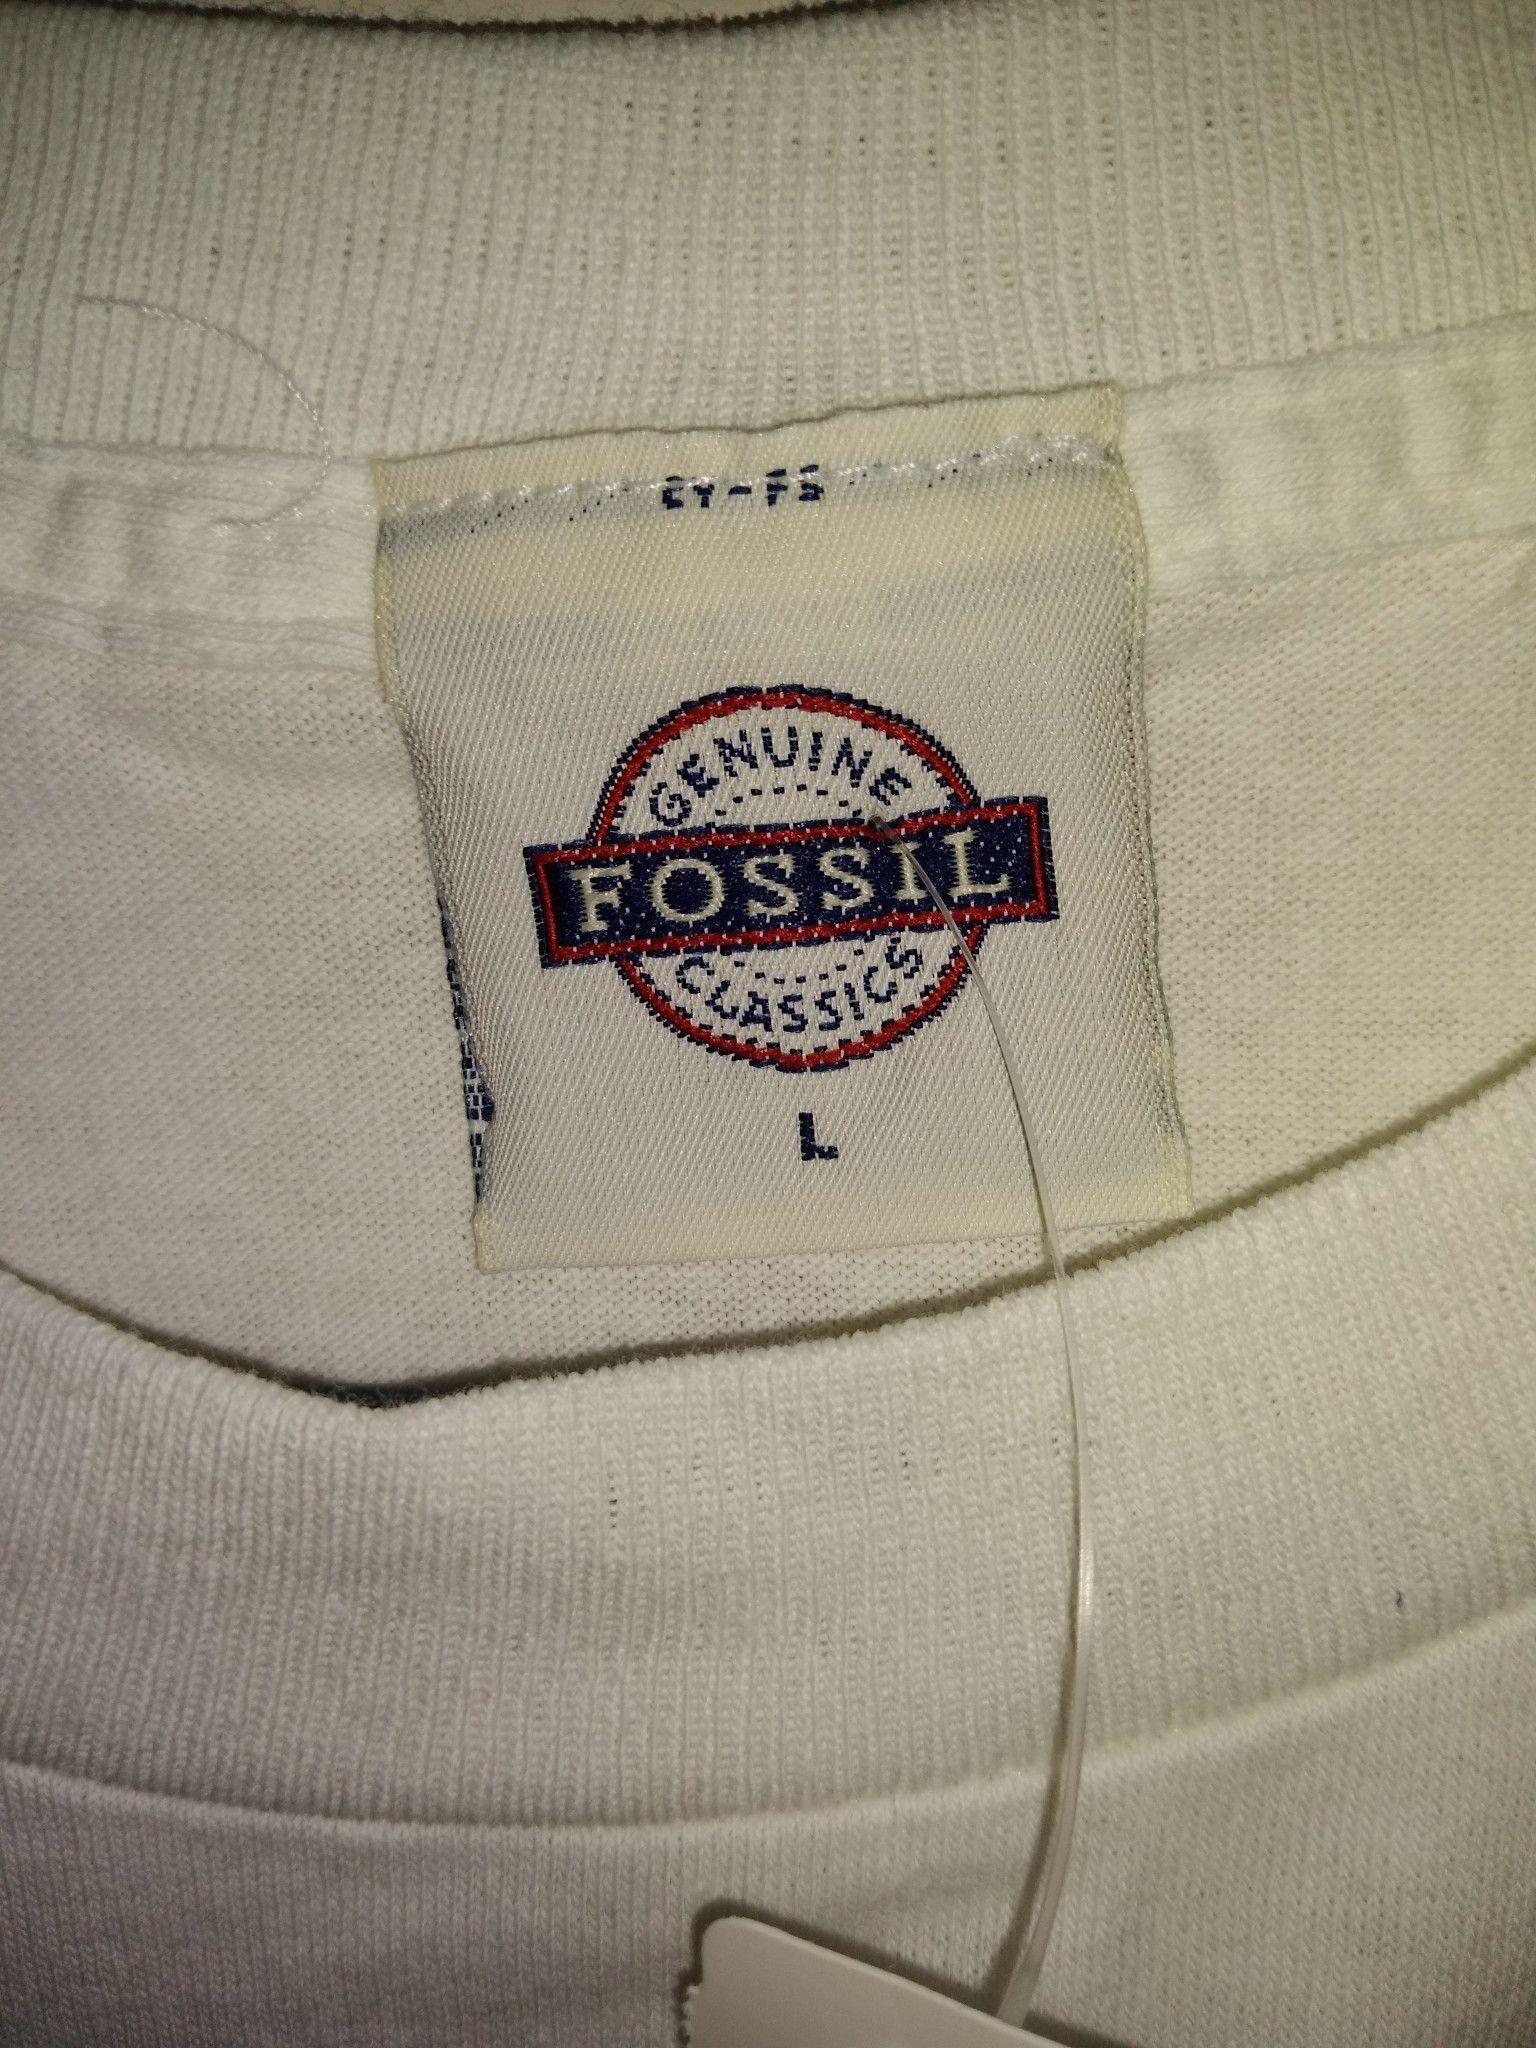 Women's L Vtg fossil graphic white t-shirt